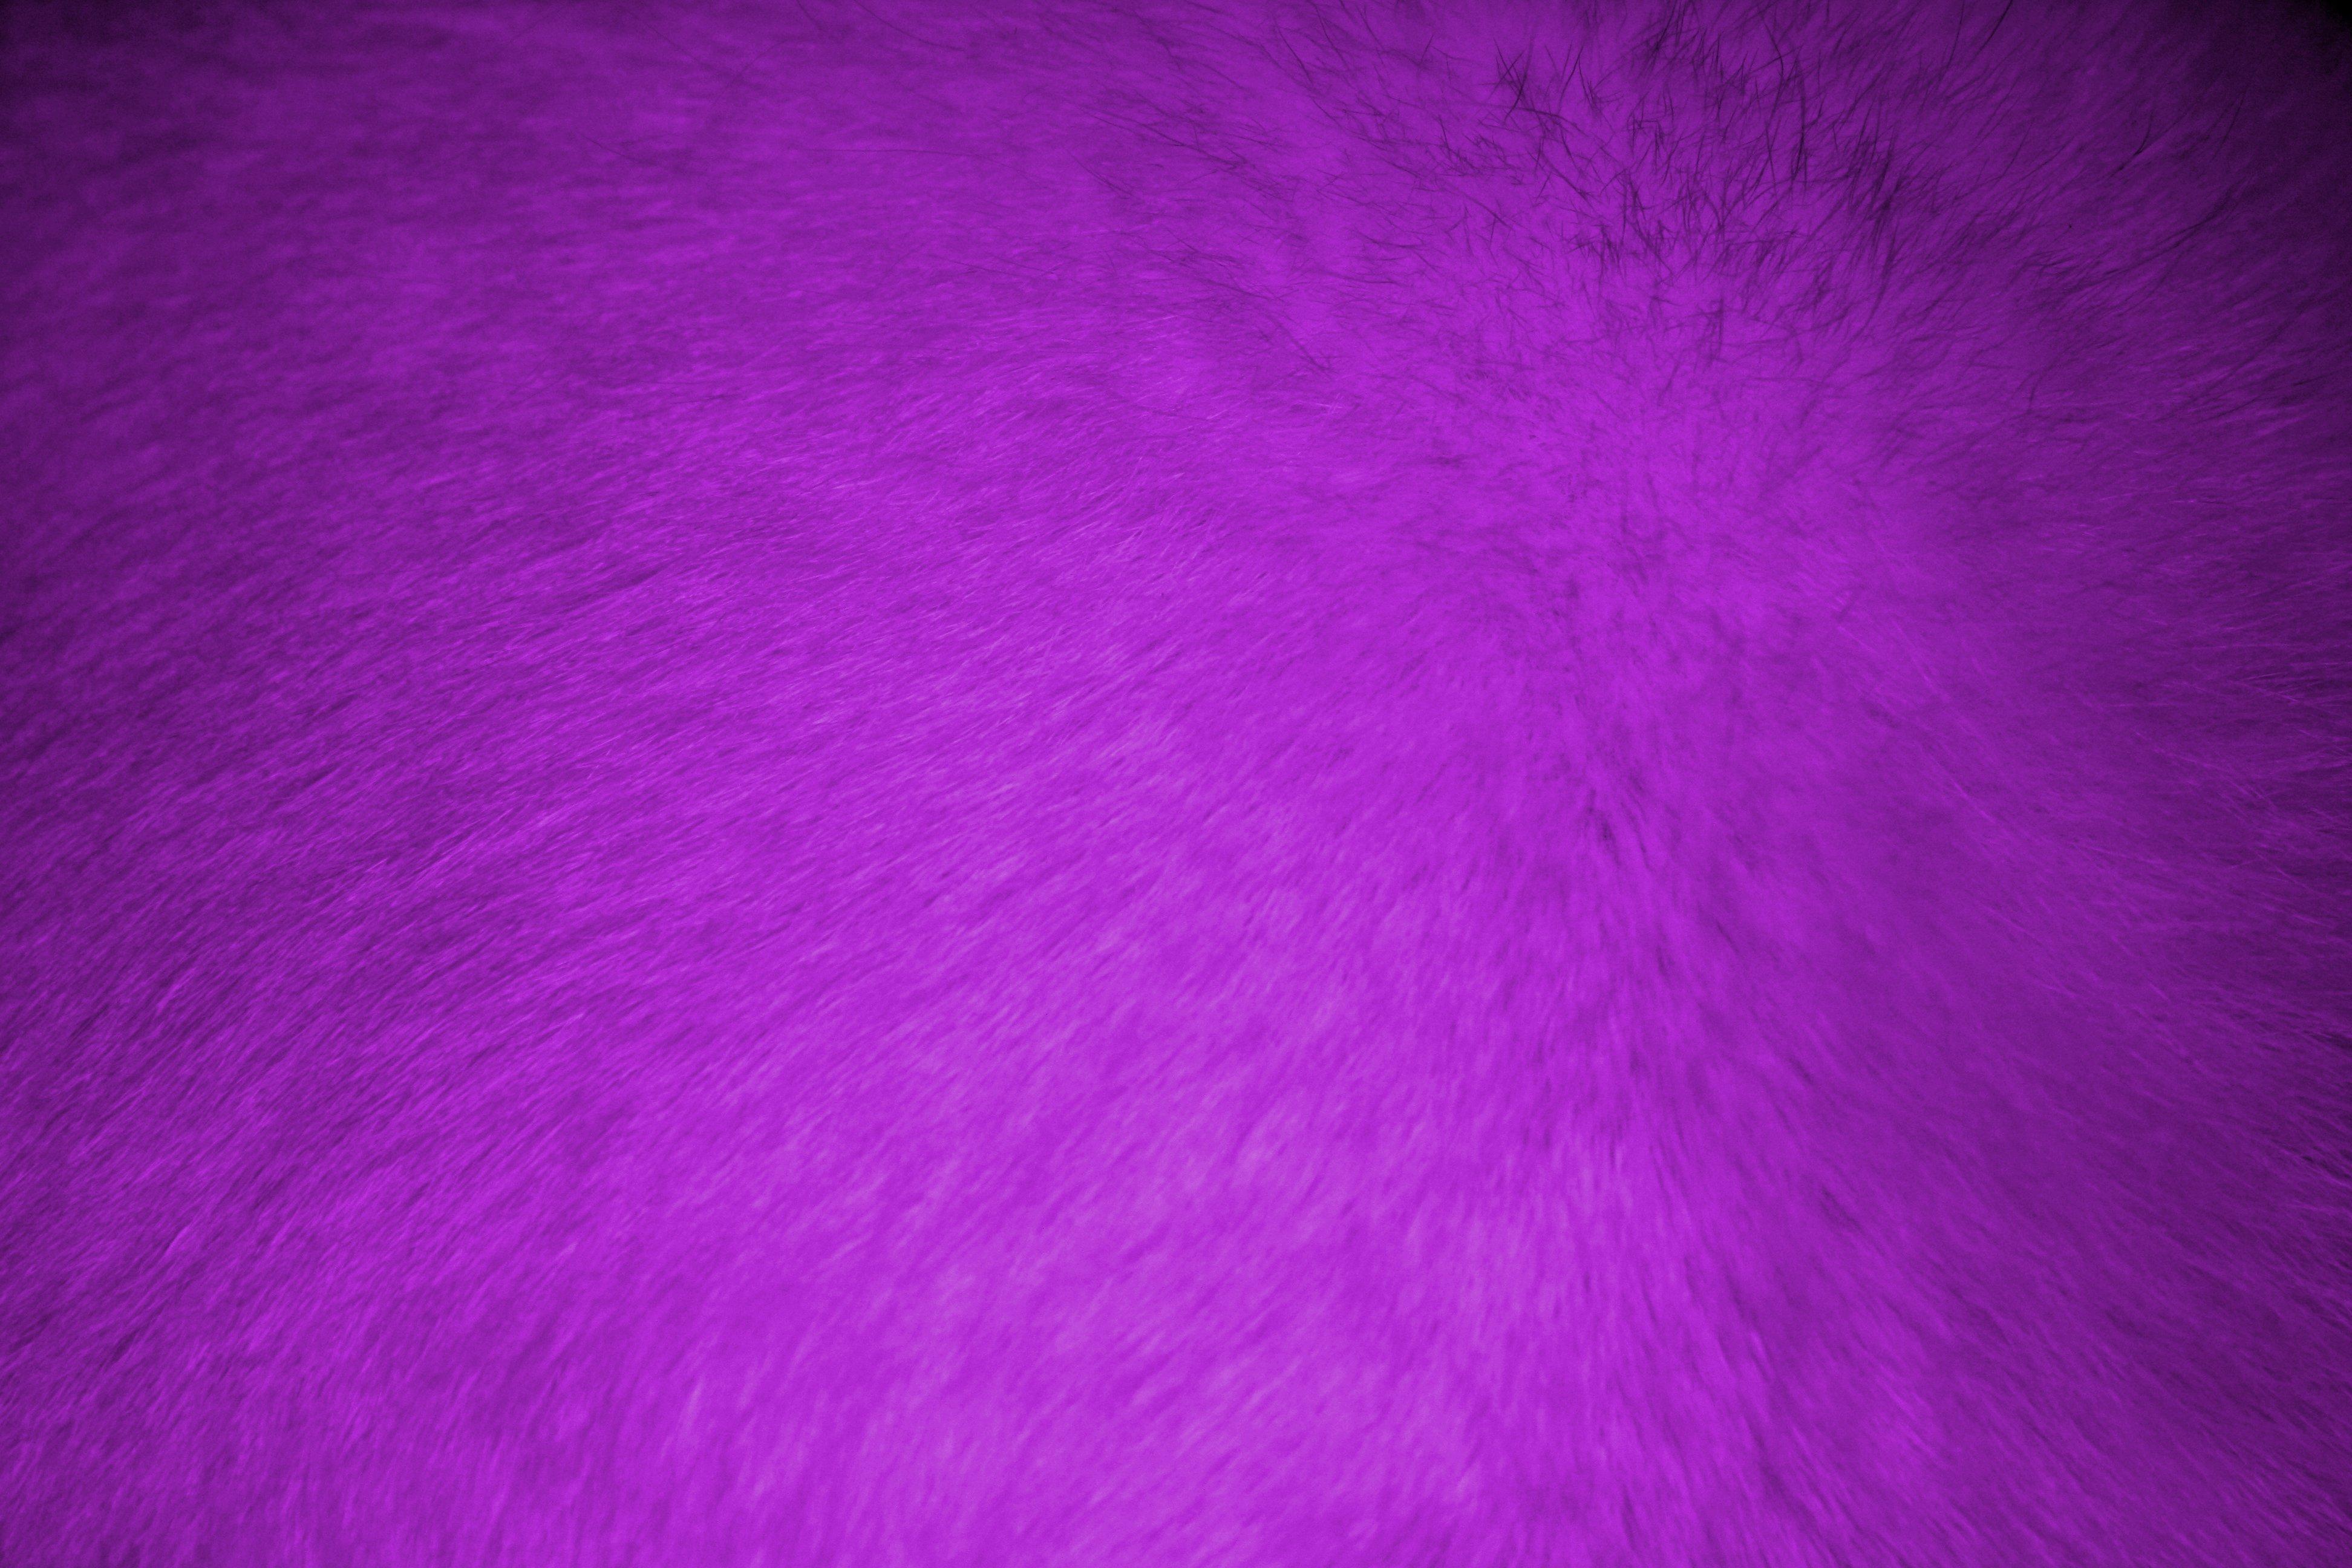 Purple Fur Texture   High Resolution Photo   Dimensions 3888 3888x2592